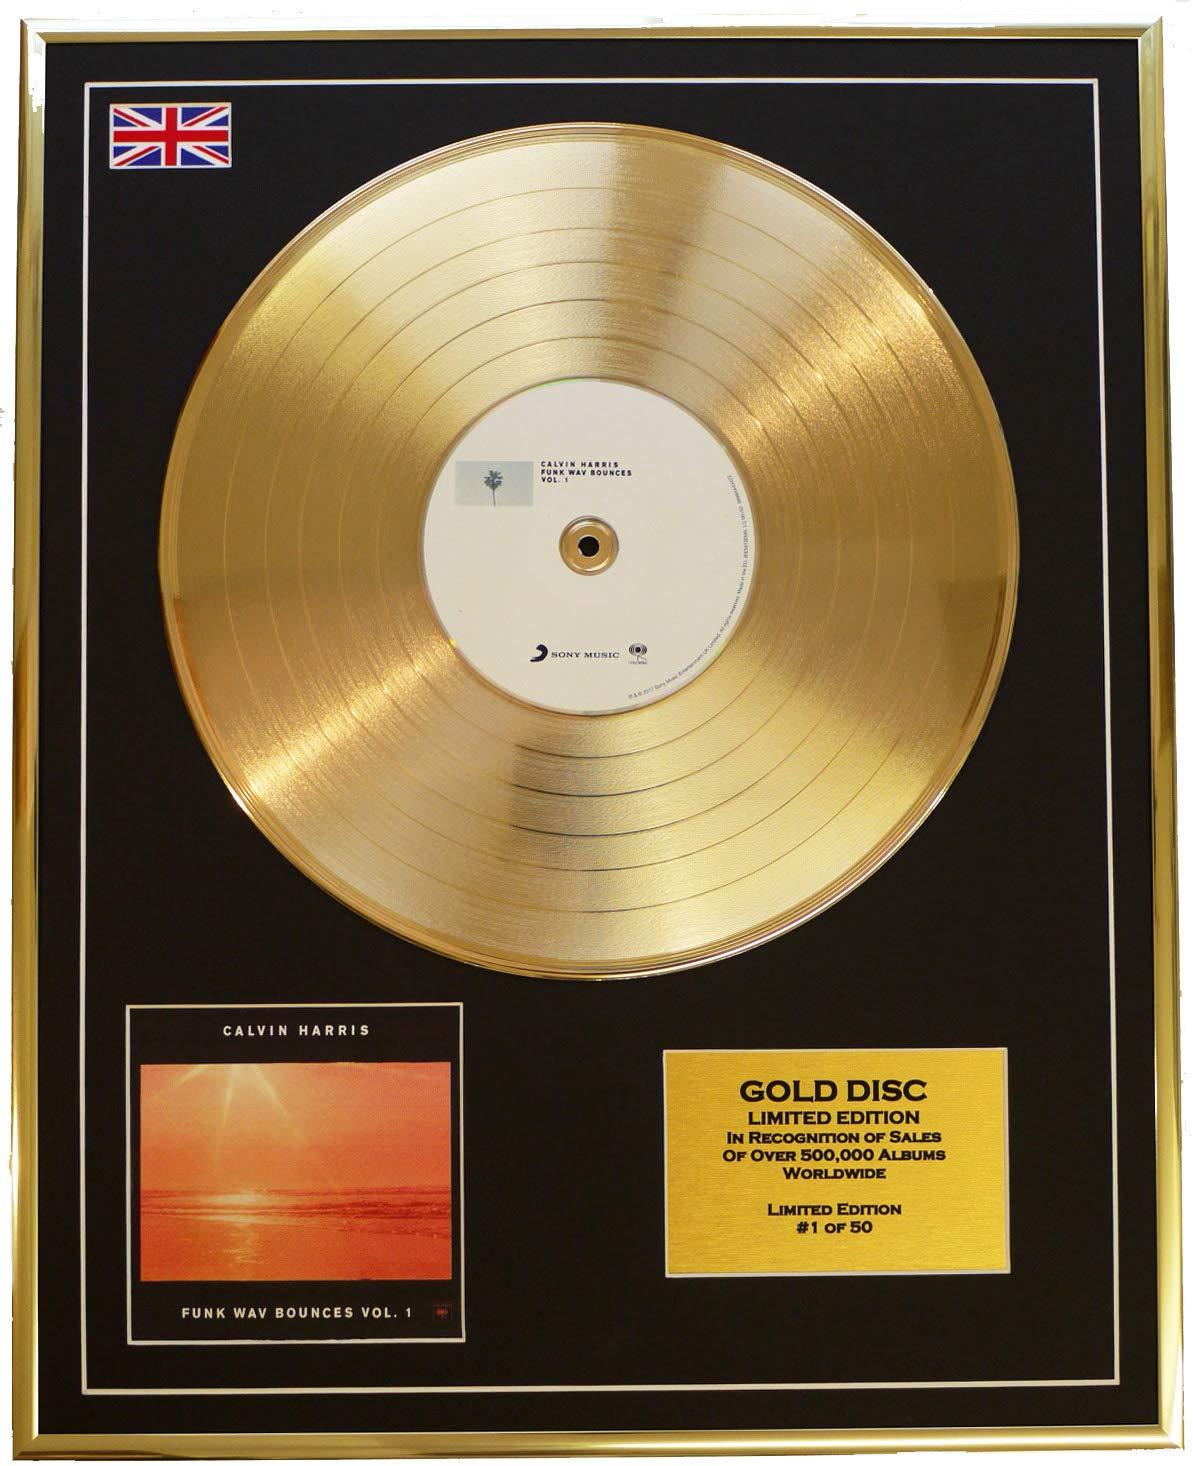 Calvin Harris/CD Disco d'oro Disco Limitata Edizione/Funk WAV BOUNCES Vol.1 Everythingcollectible